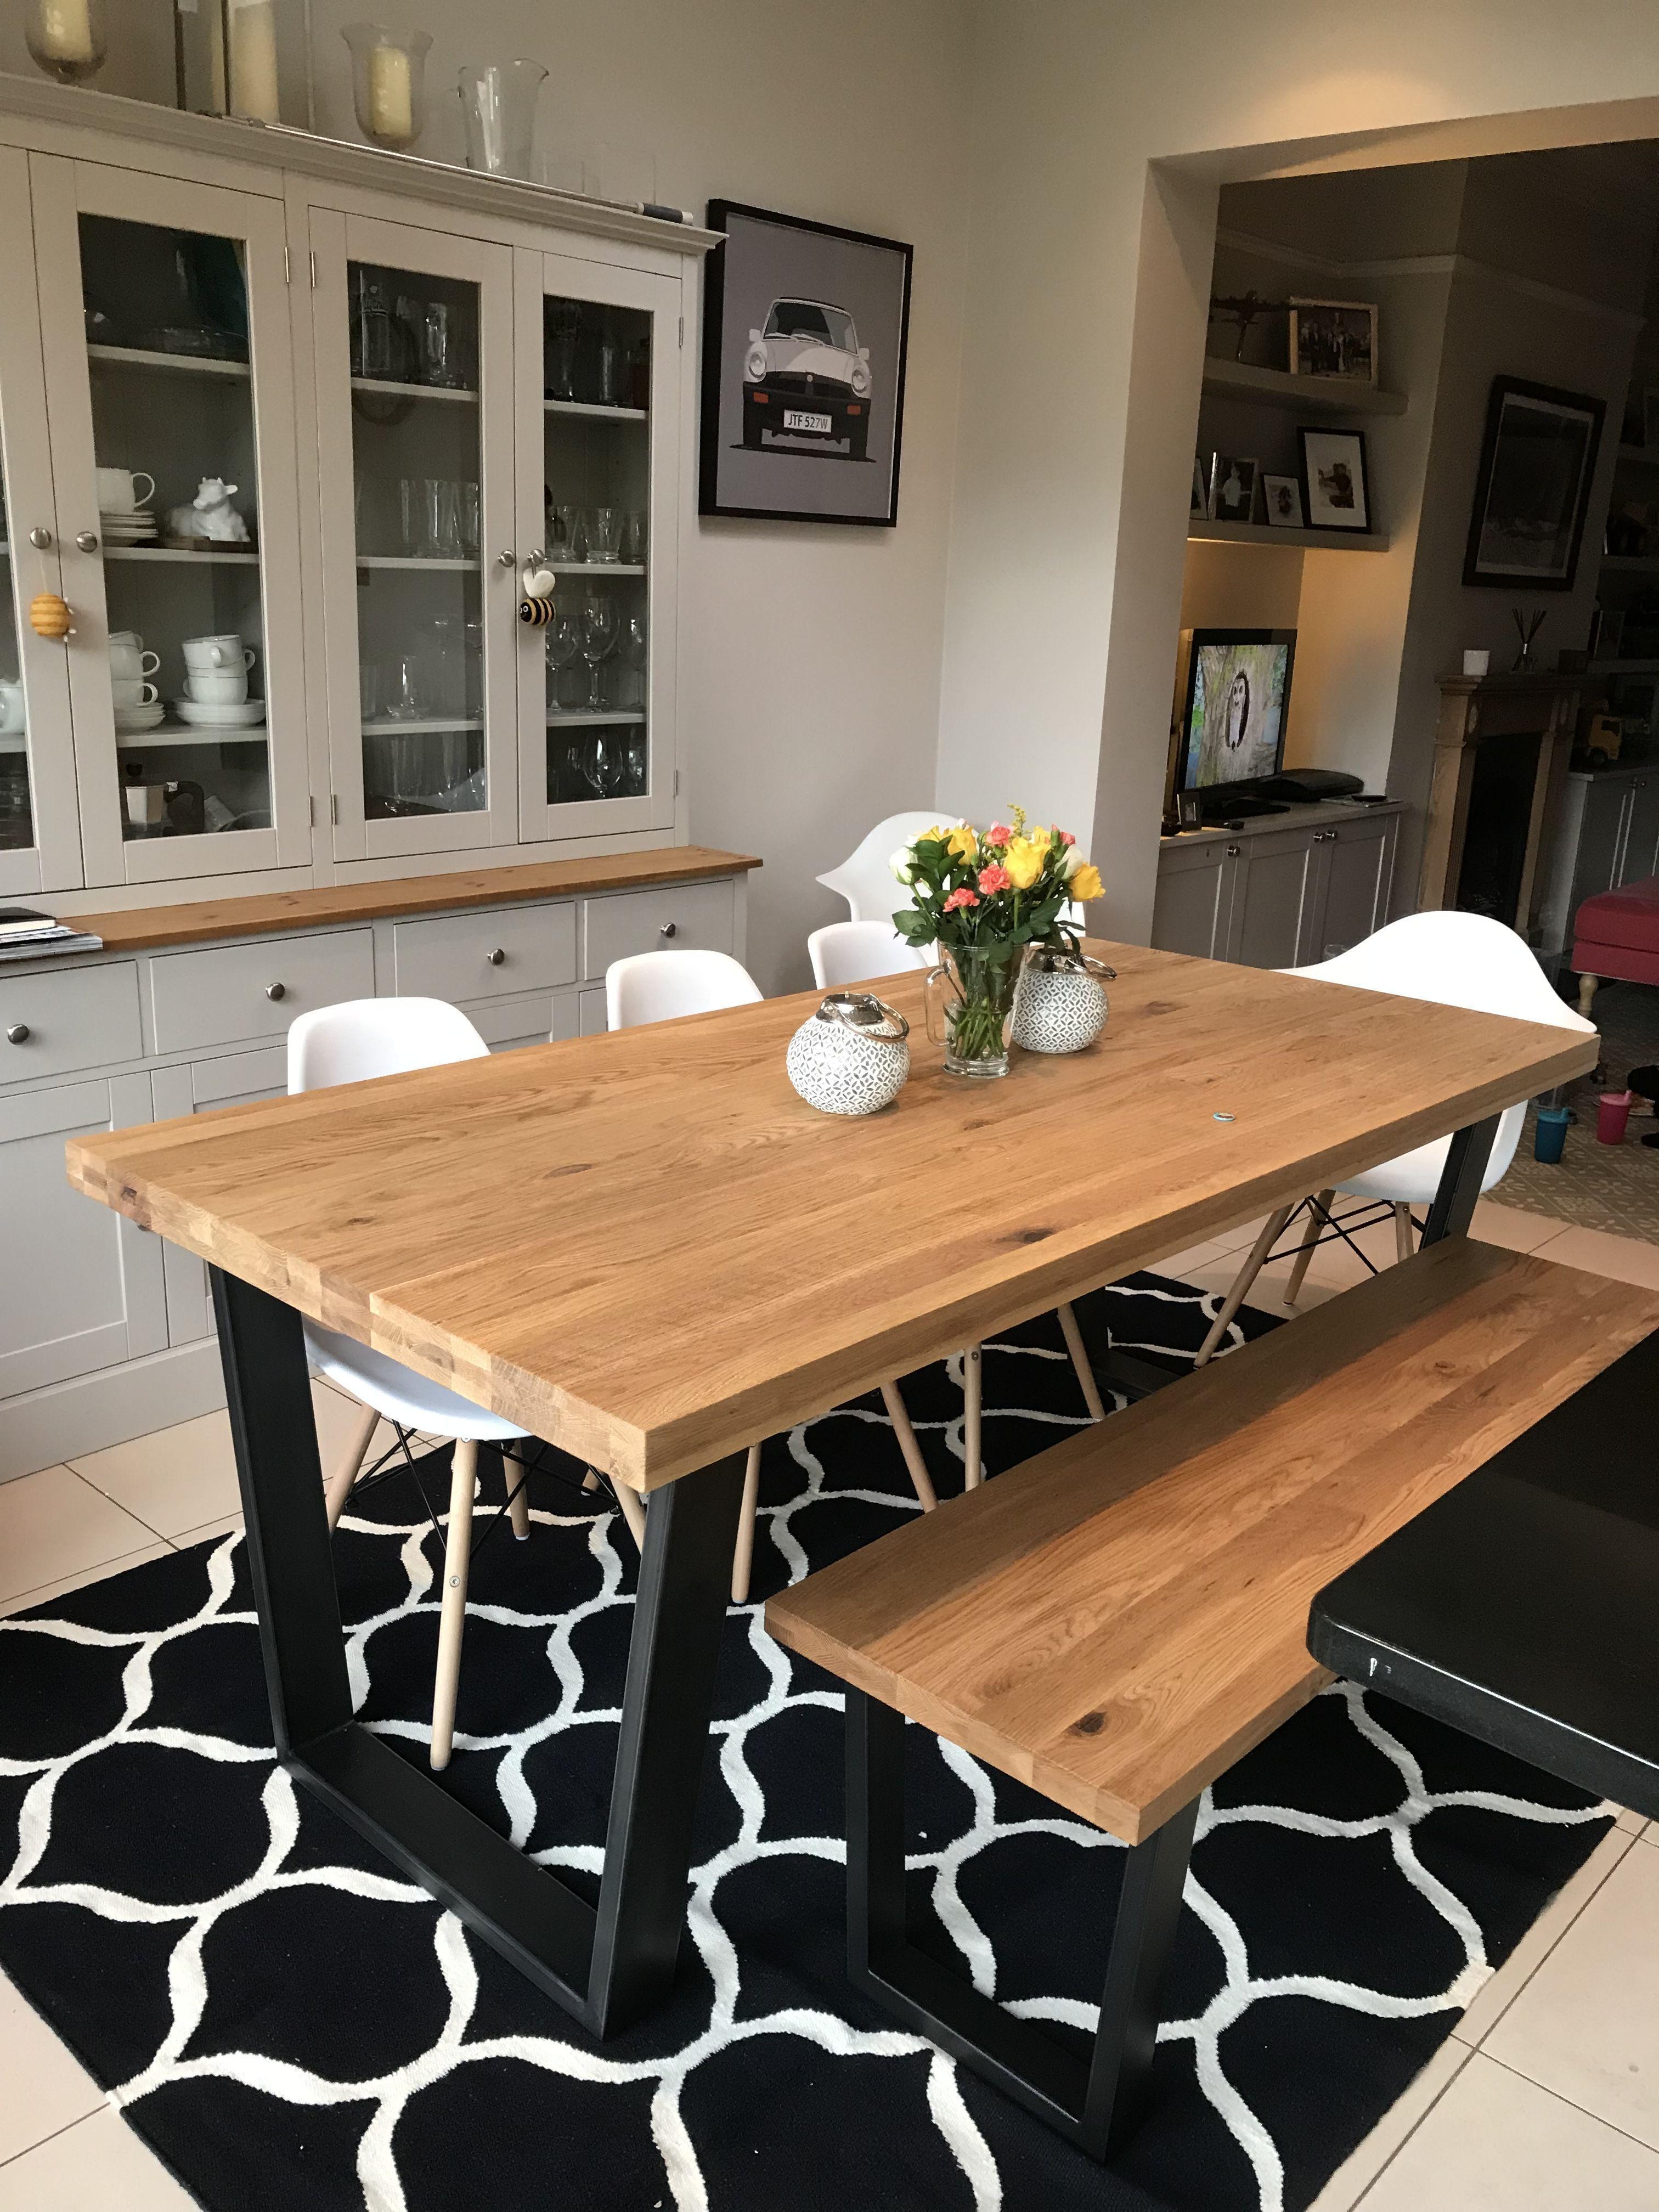 John Lewis Kitchen Table And Chair SetsJohn Lewis Kitchen Table